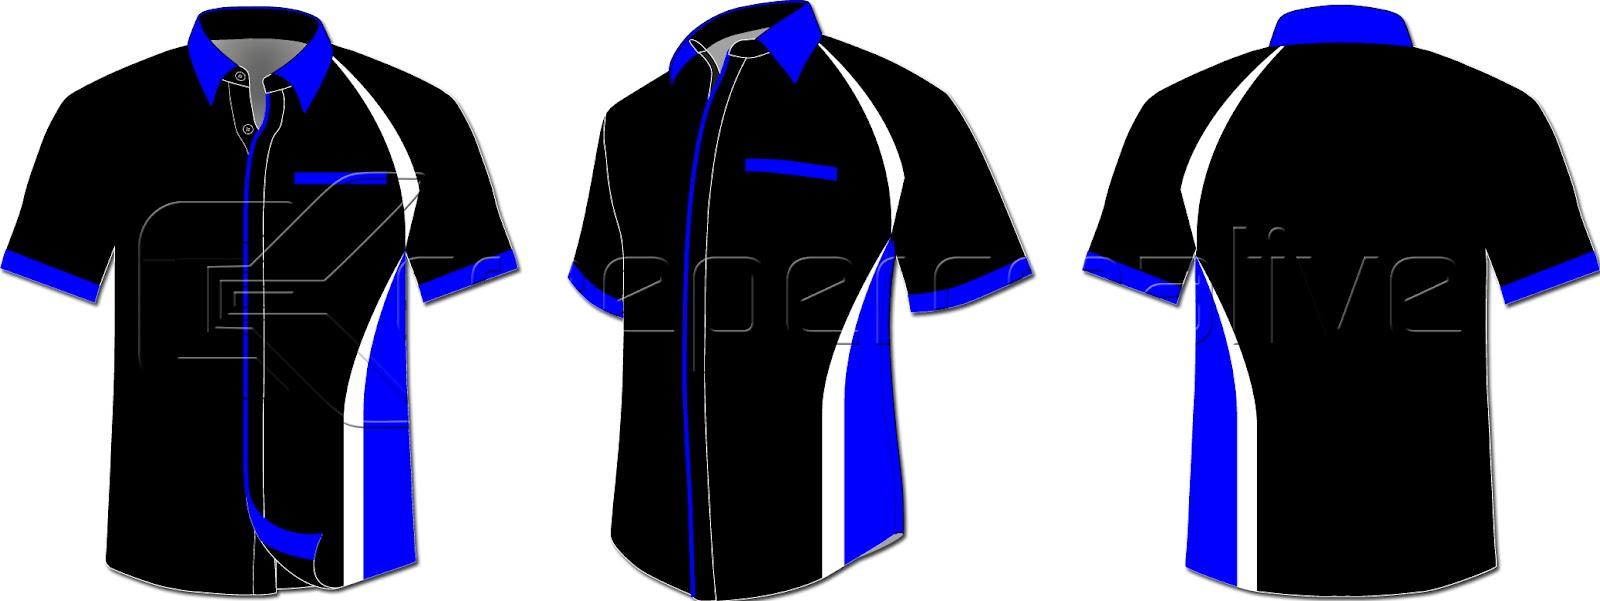 Corporate Shirt Cs 04 Series Creeper Design